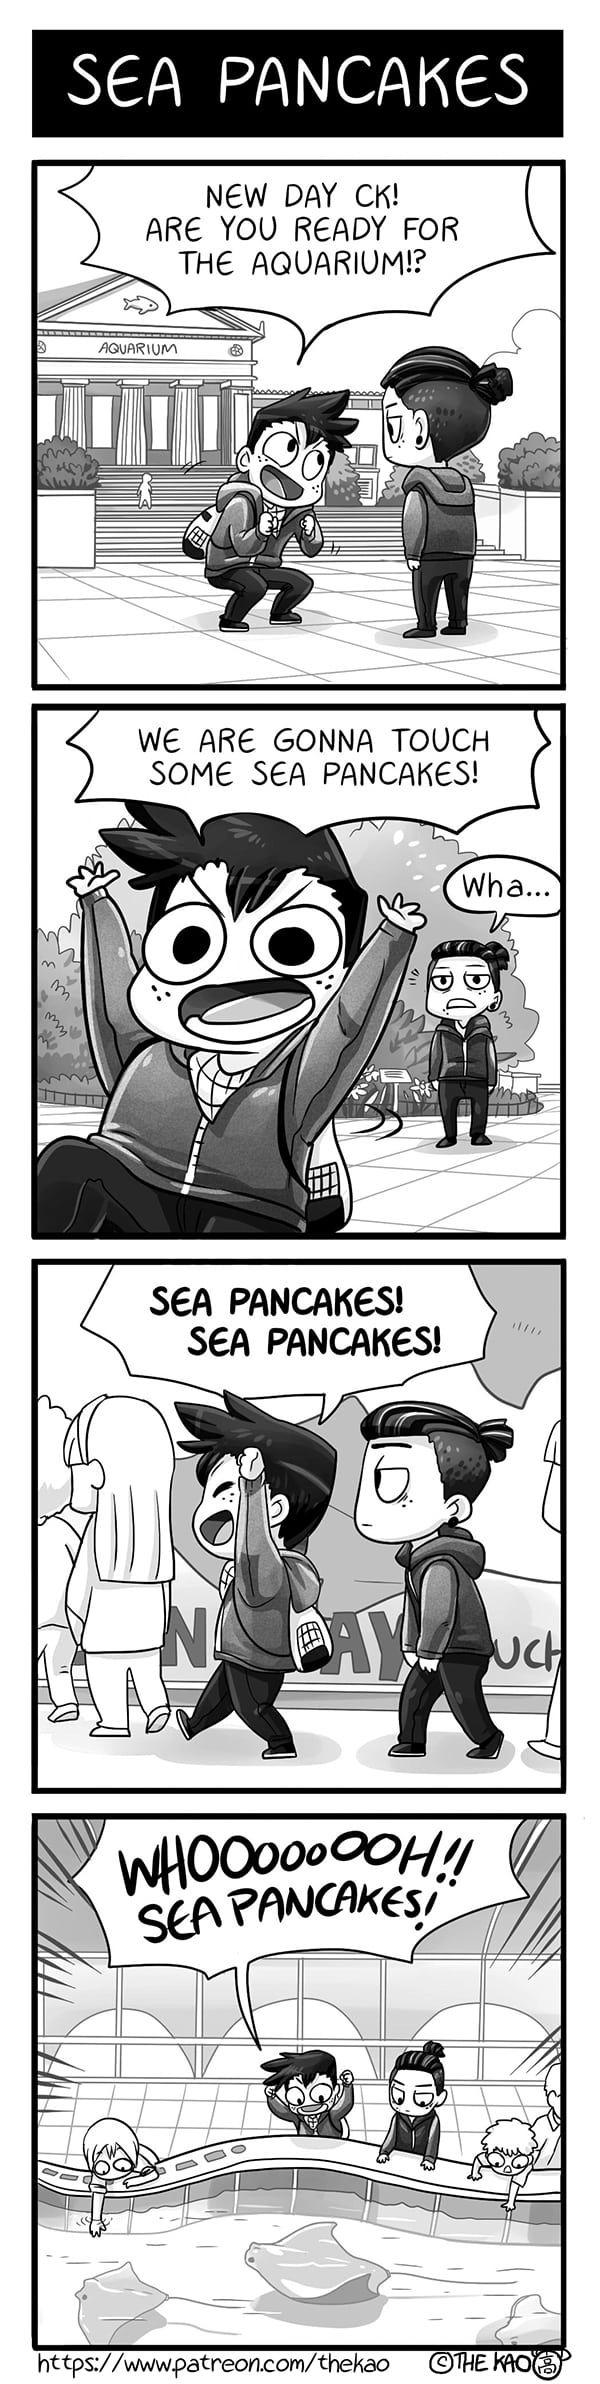 Mondo Mango :: Sea Pancakes   Tapastic Comics - image 1